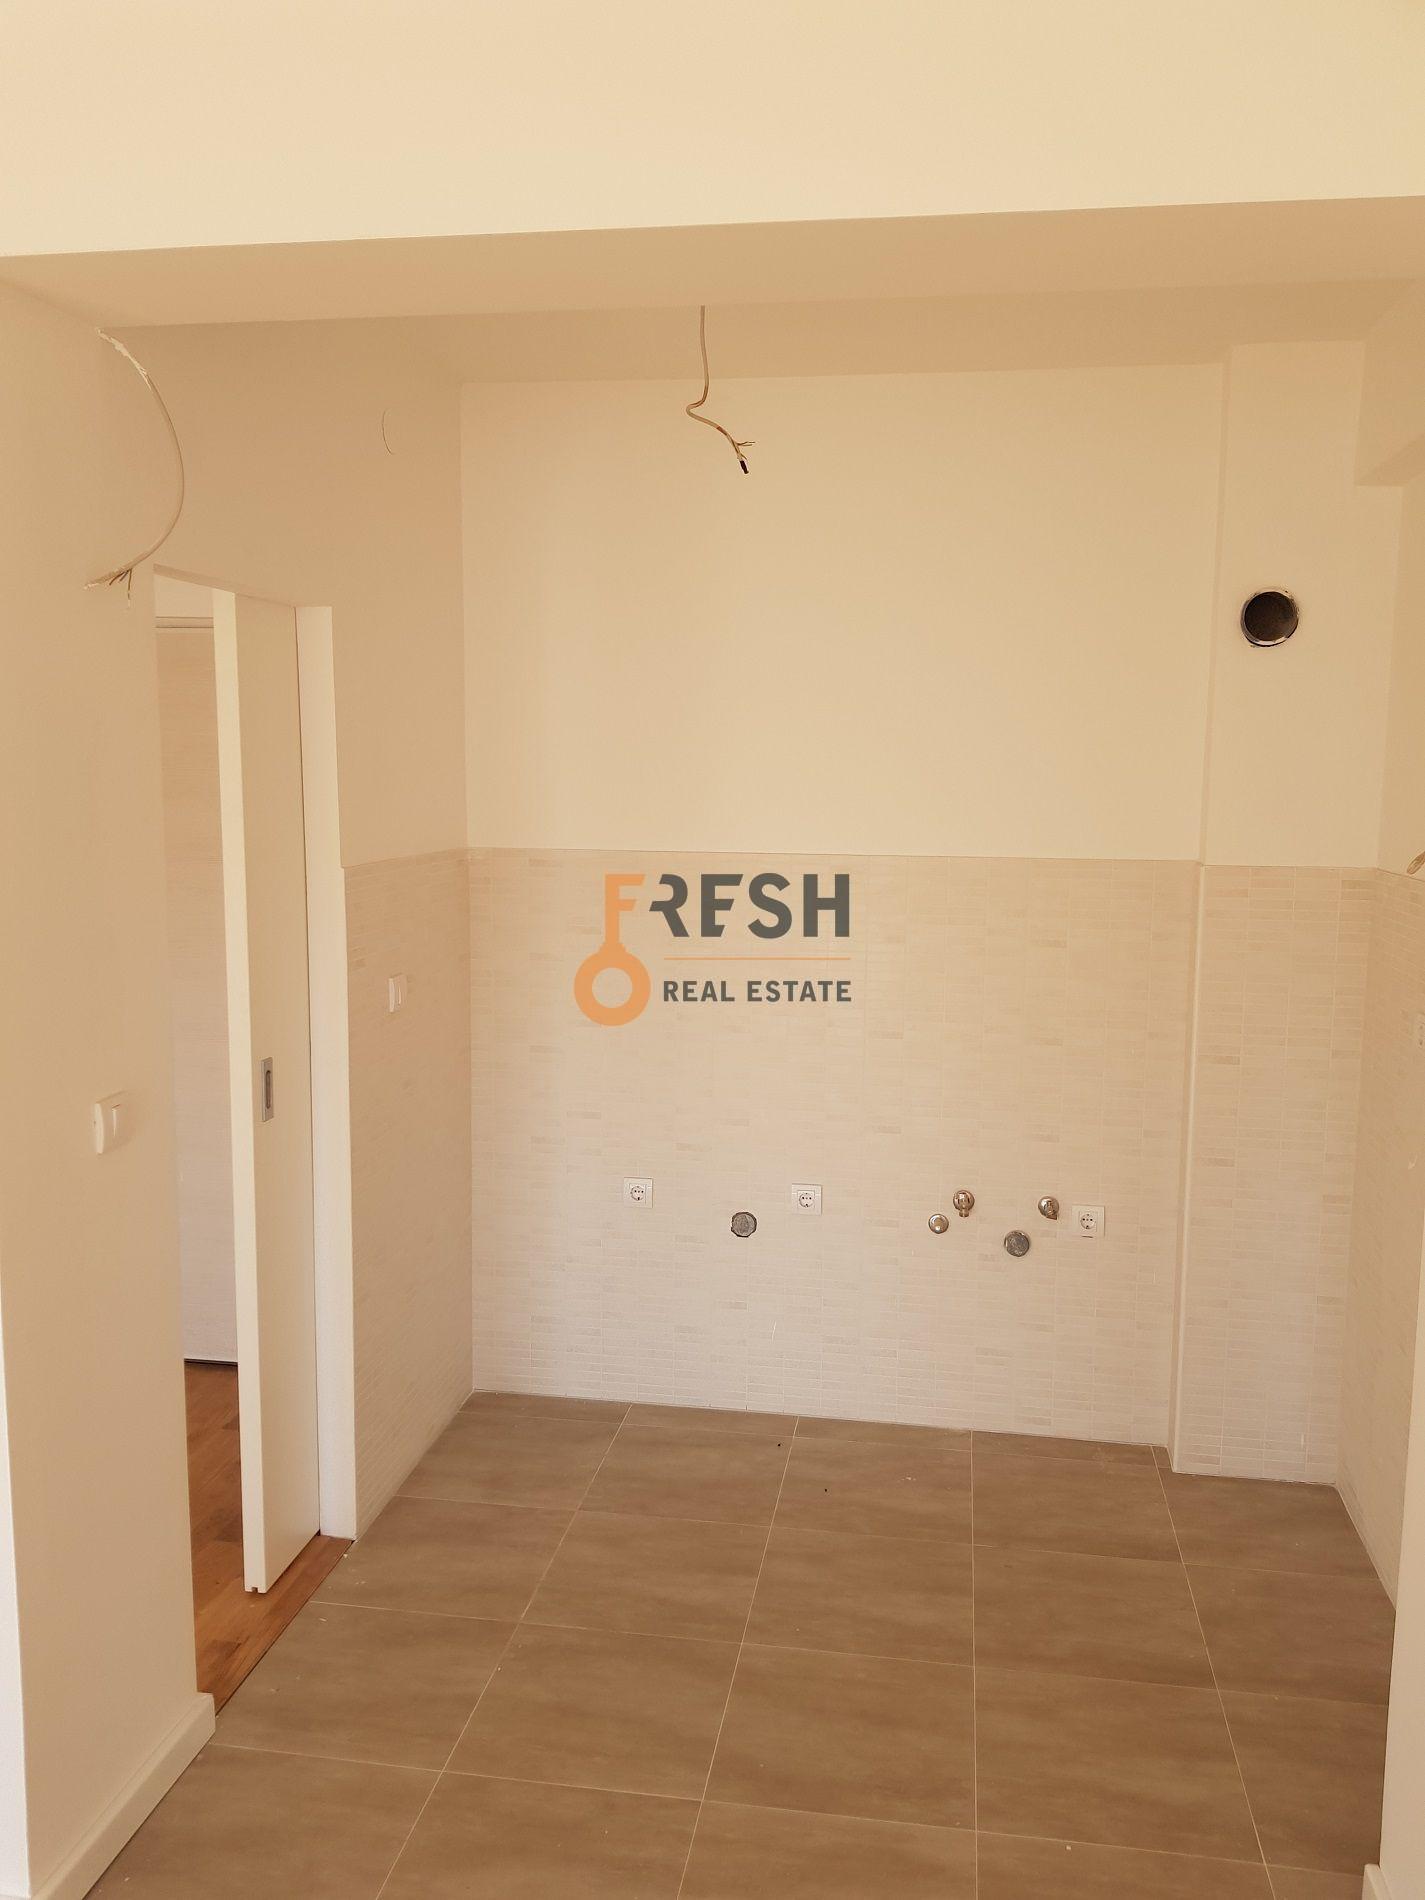 Jednosoban stan 45 m2, Centar, Pljevlja, Prodaja - 8